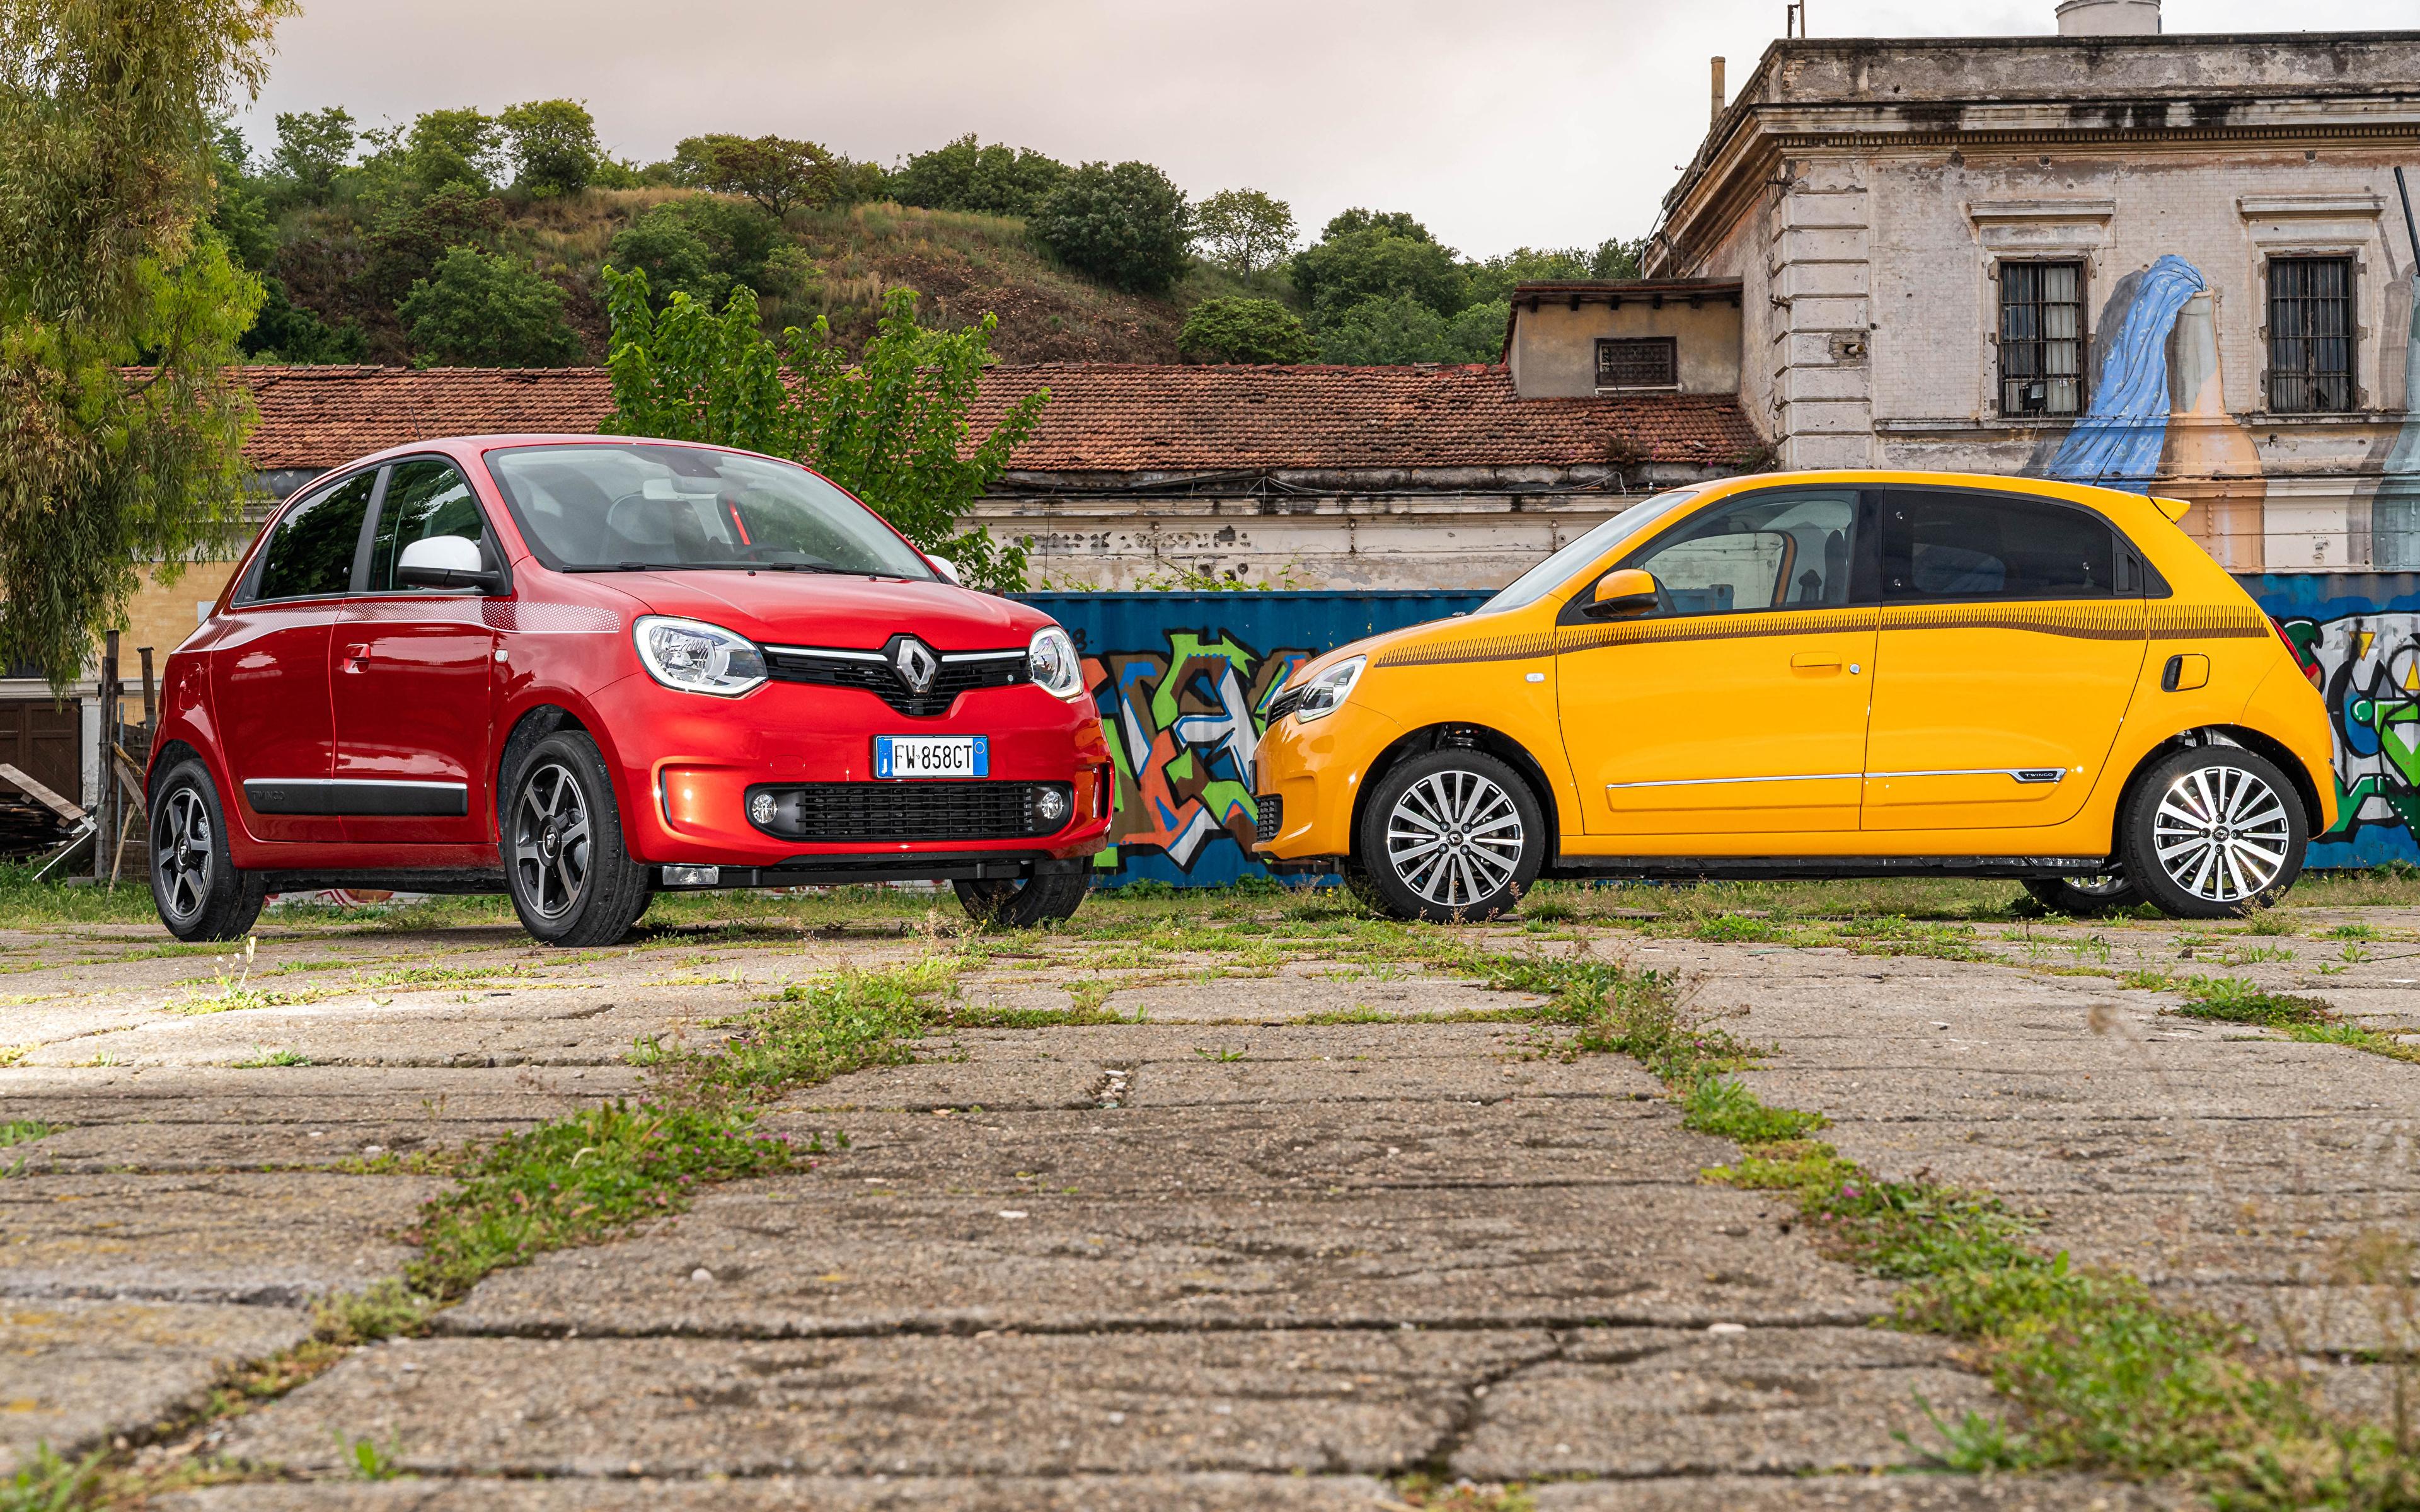 Photos Renault 2019-20 Twingo Worldwide Two auto 3840x2400 2 Cars automobile